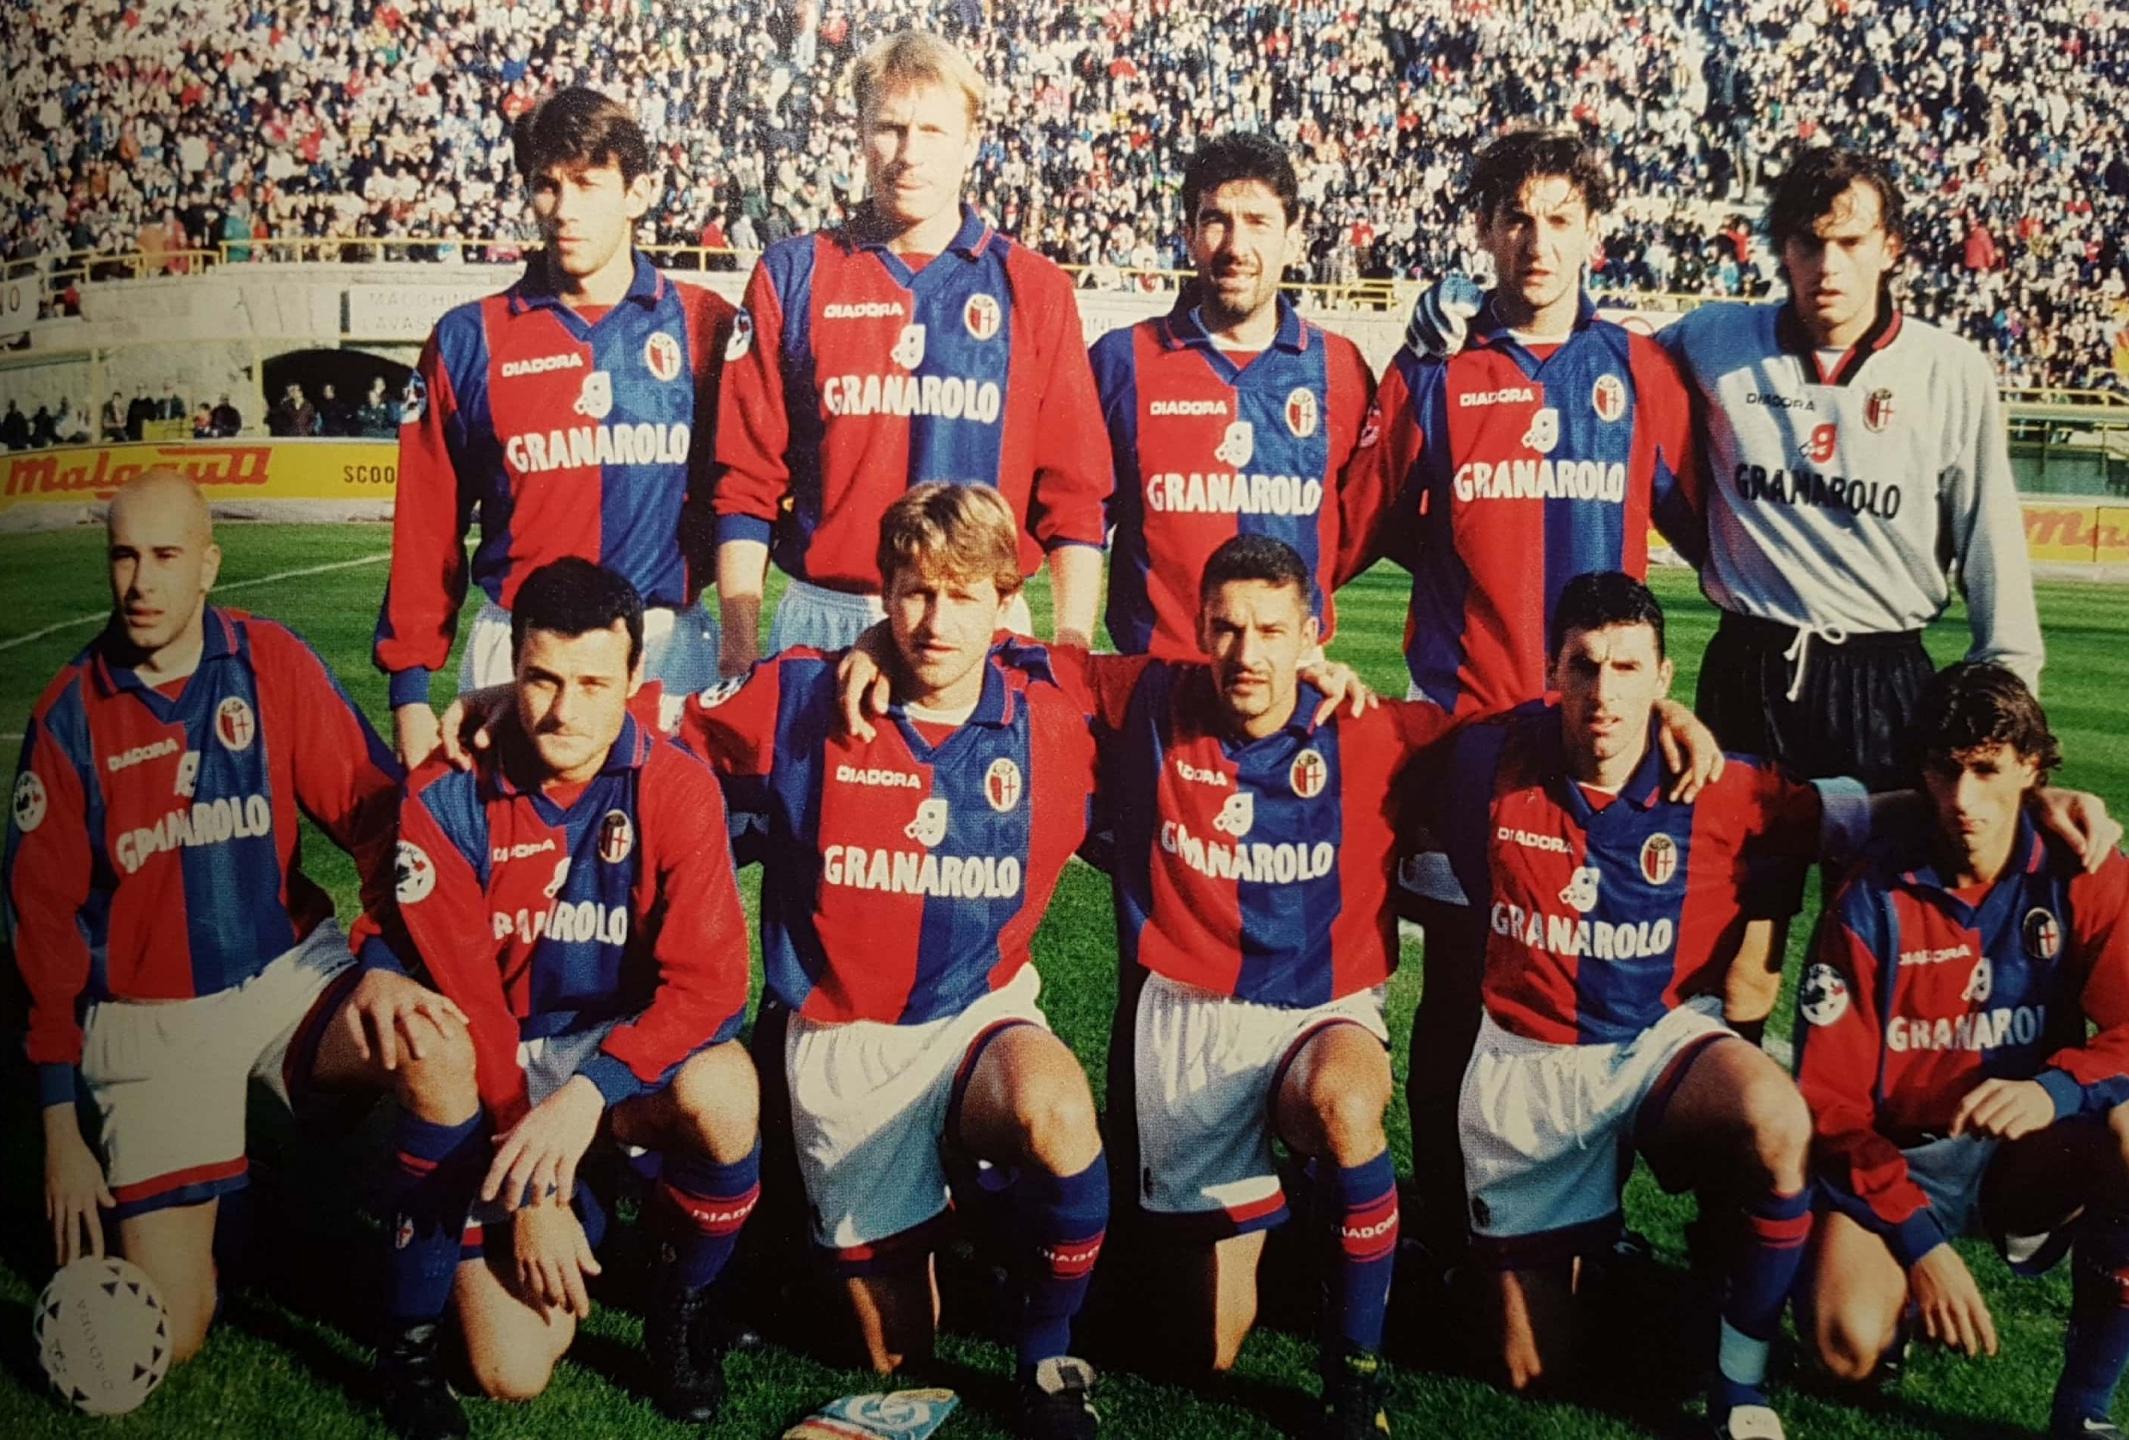 Bologna Football Club 1909 1997-1998 - Wikipedia